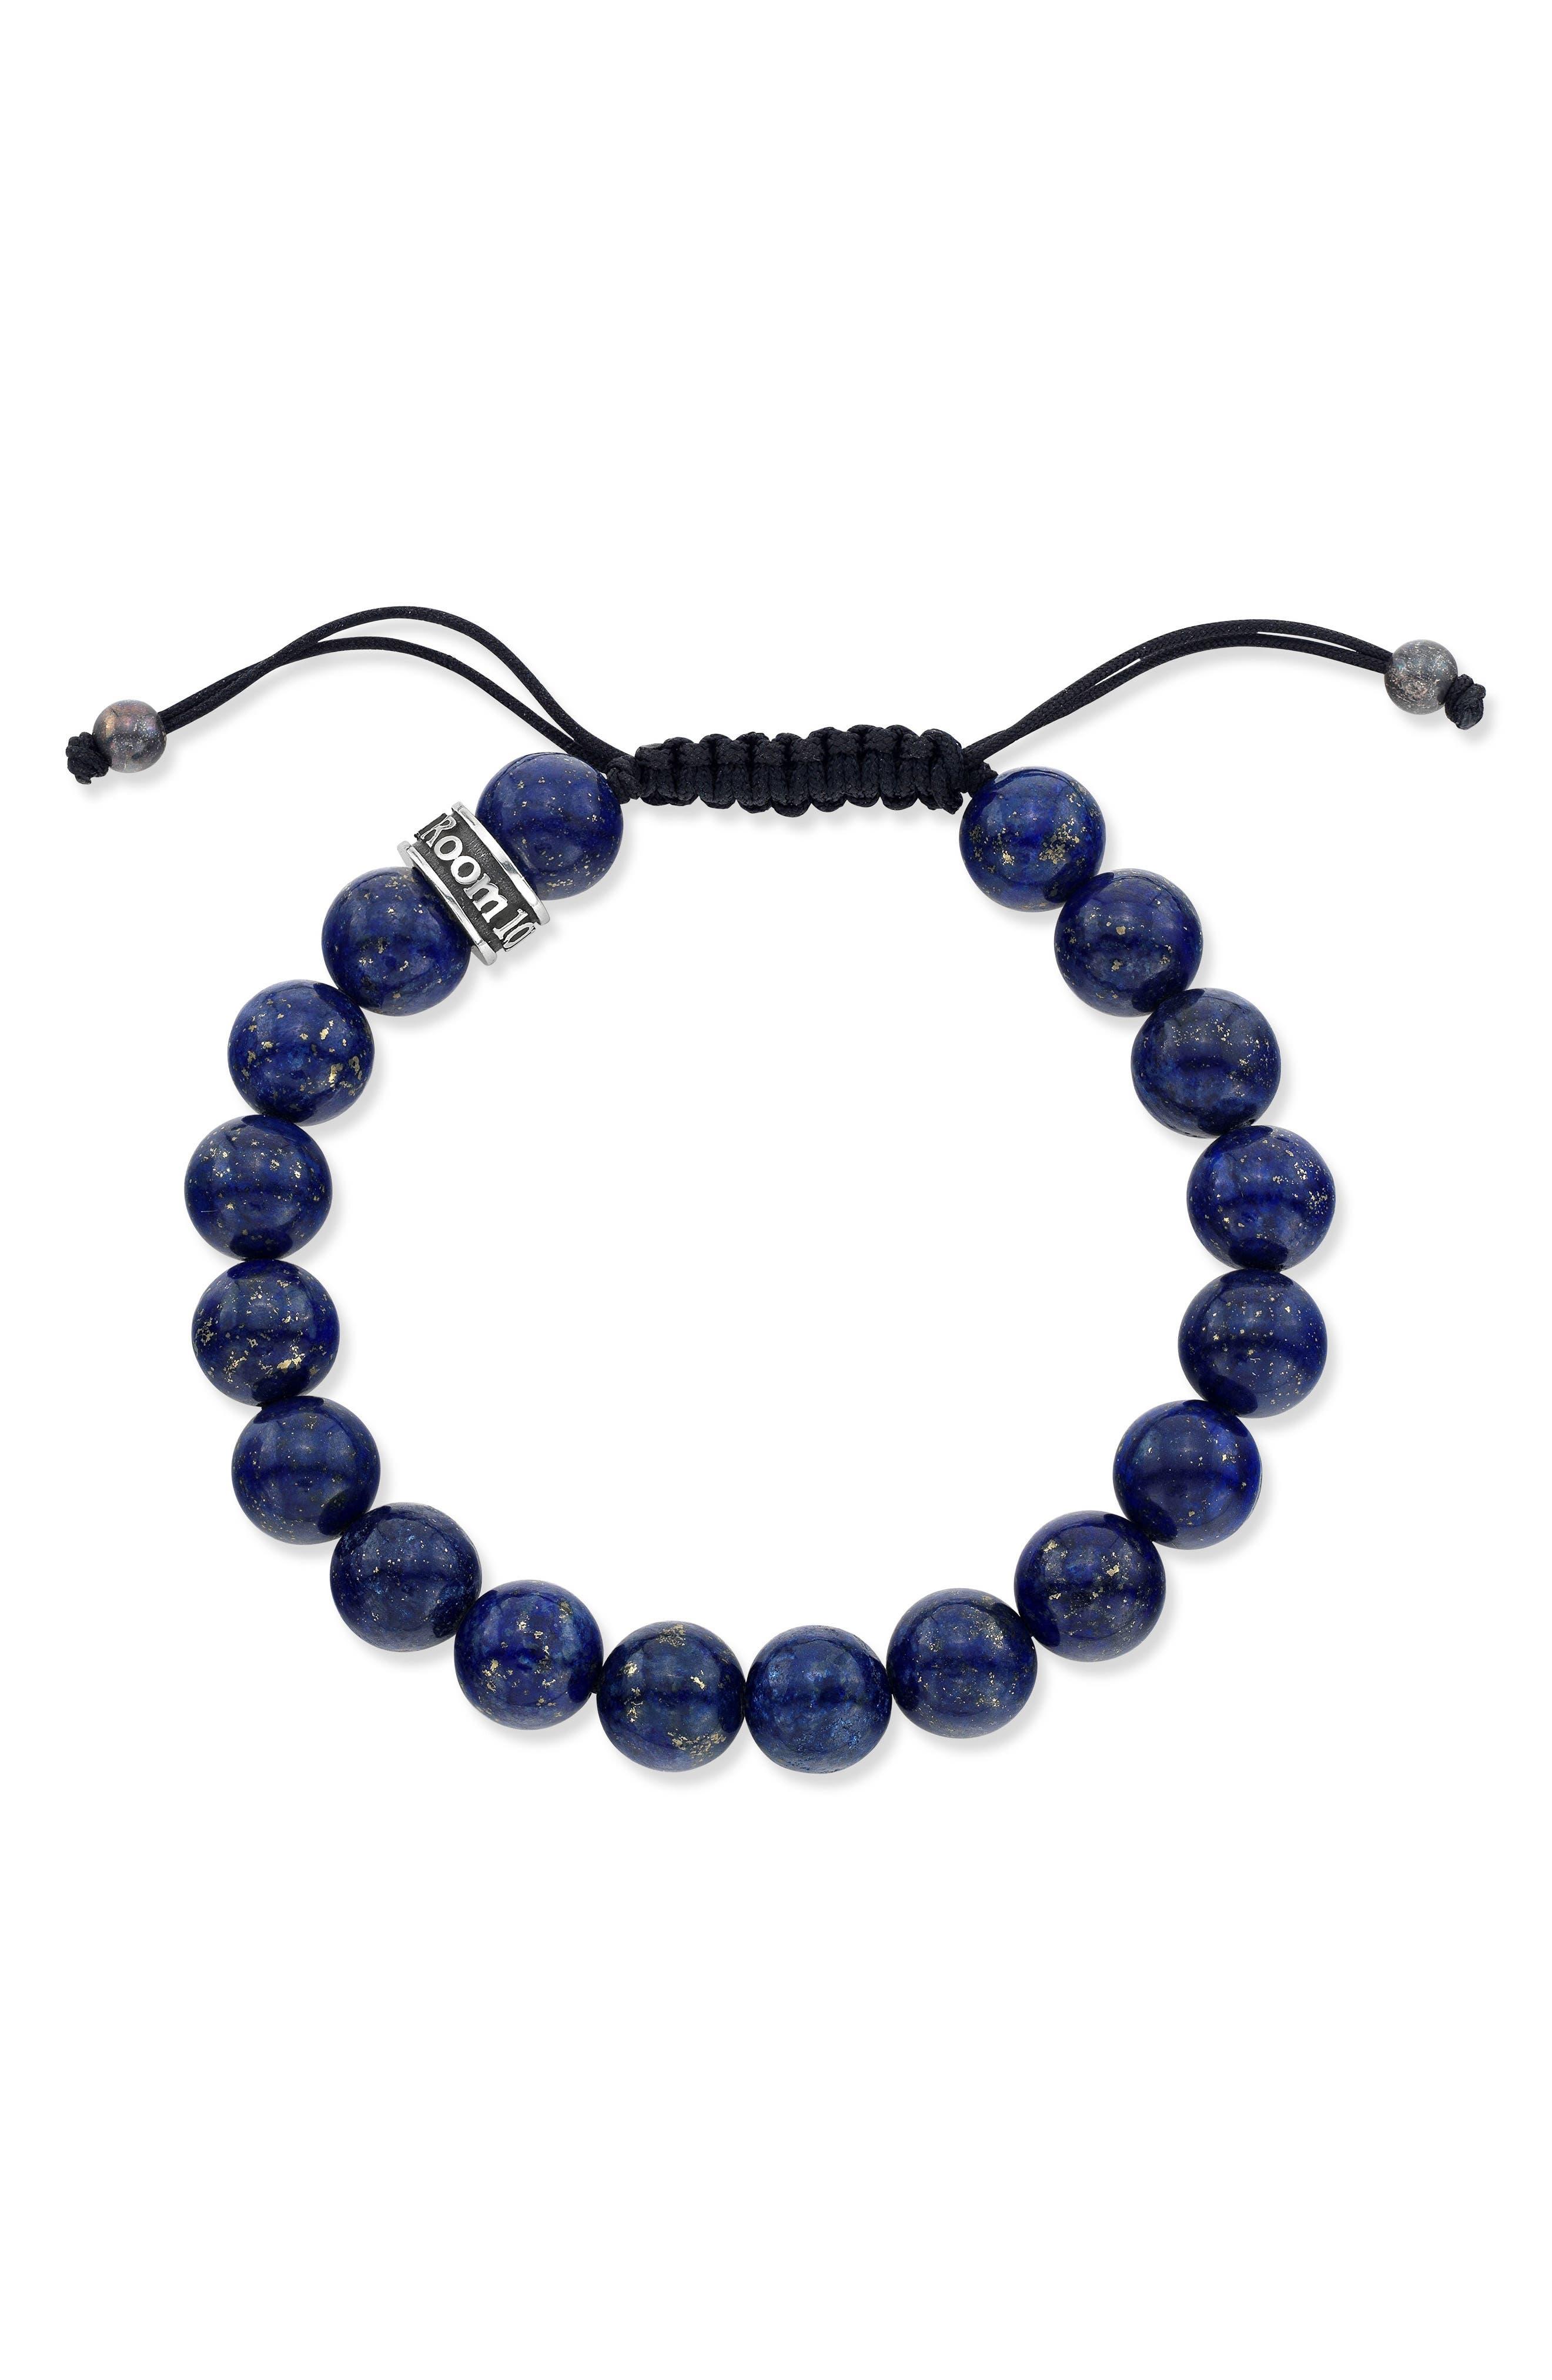 Alternate Image 1 Selected - Room101 Lapis Lazuli Bead Shamballa Bracelet